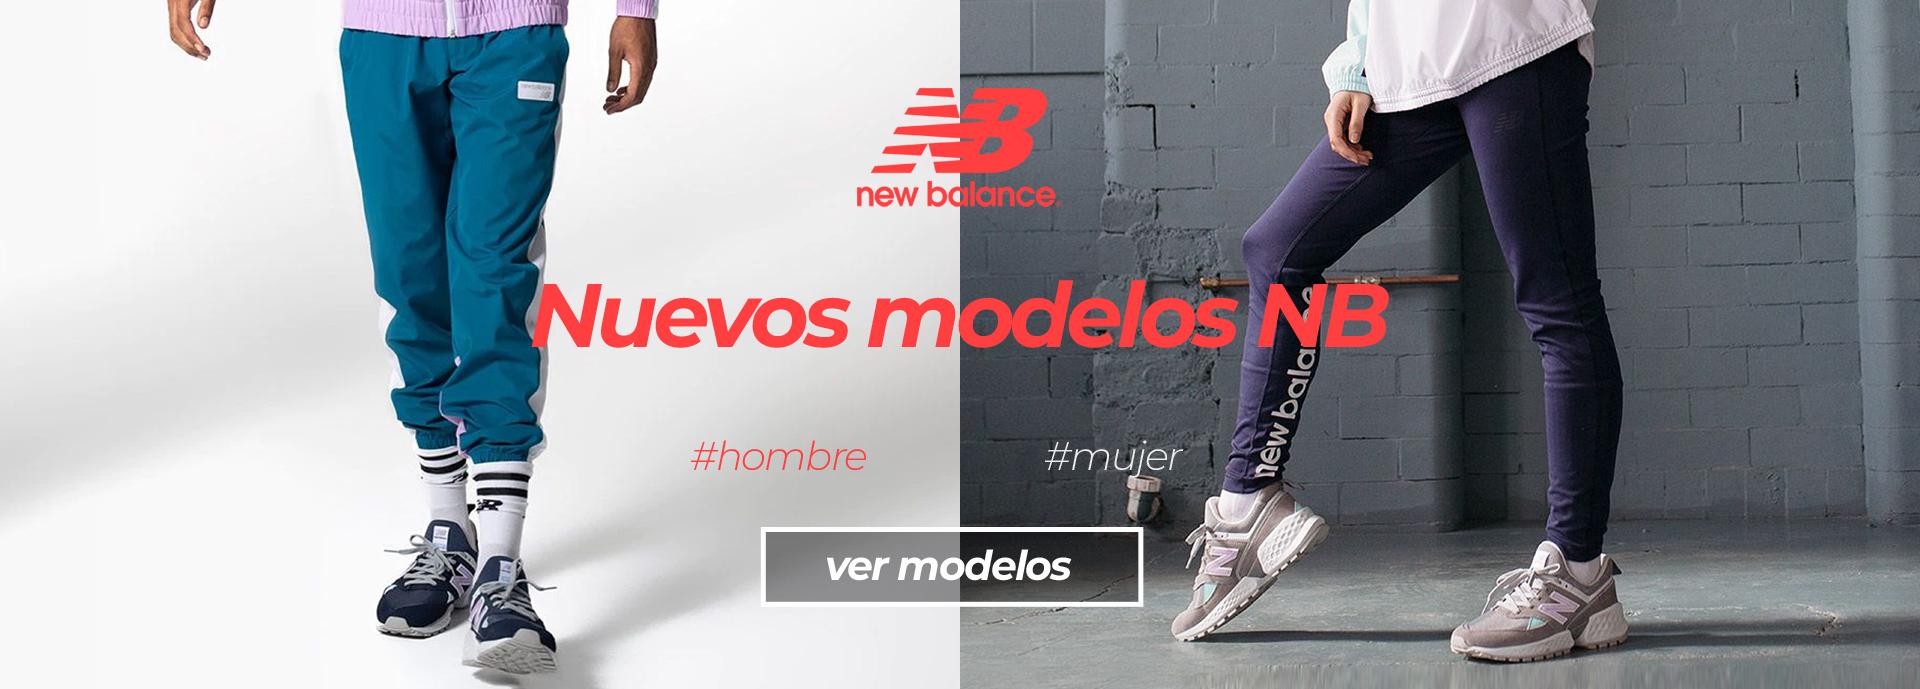 new balance cw997 hombre